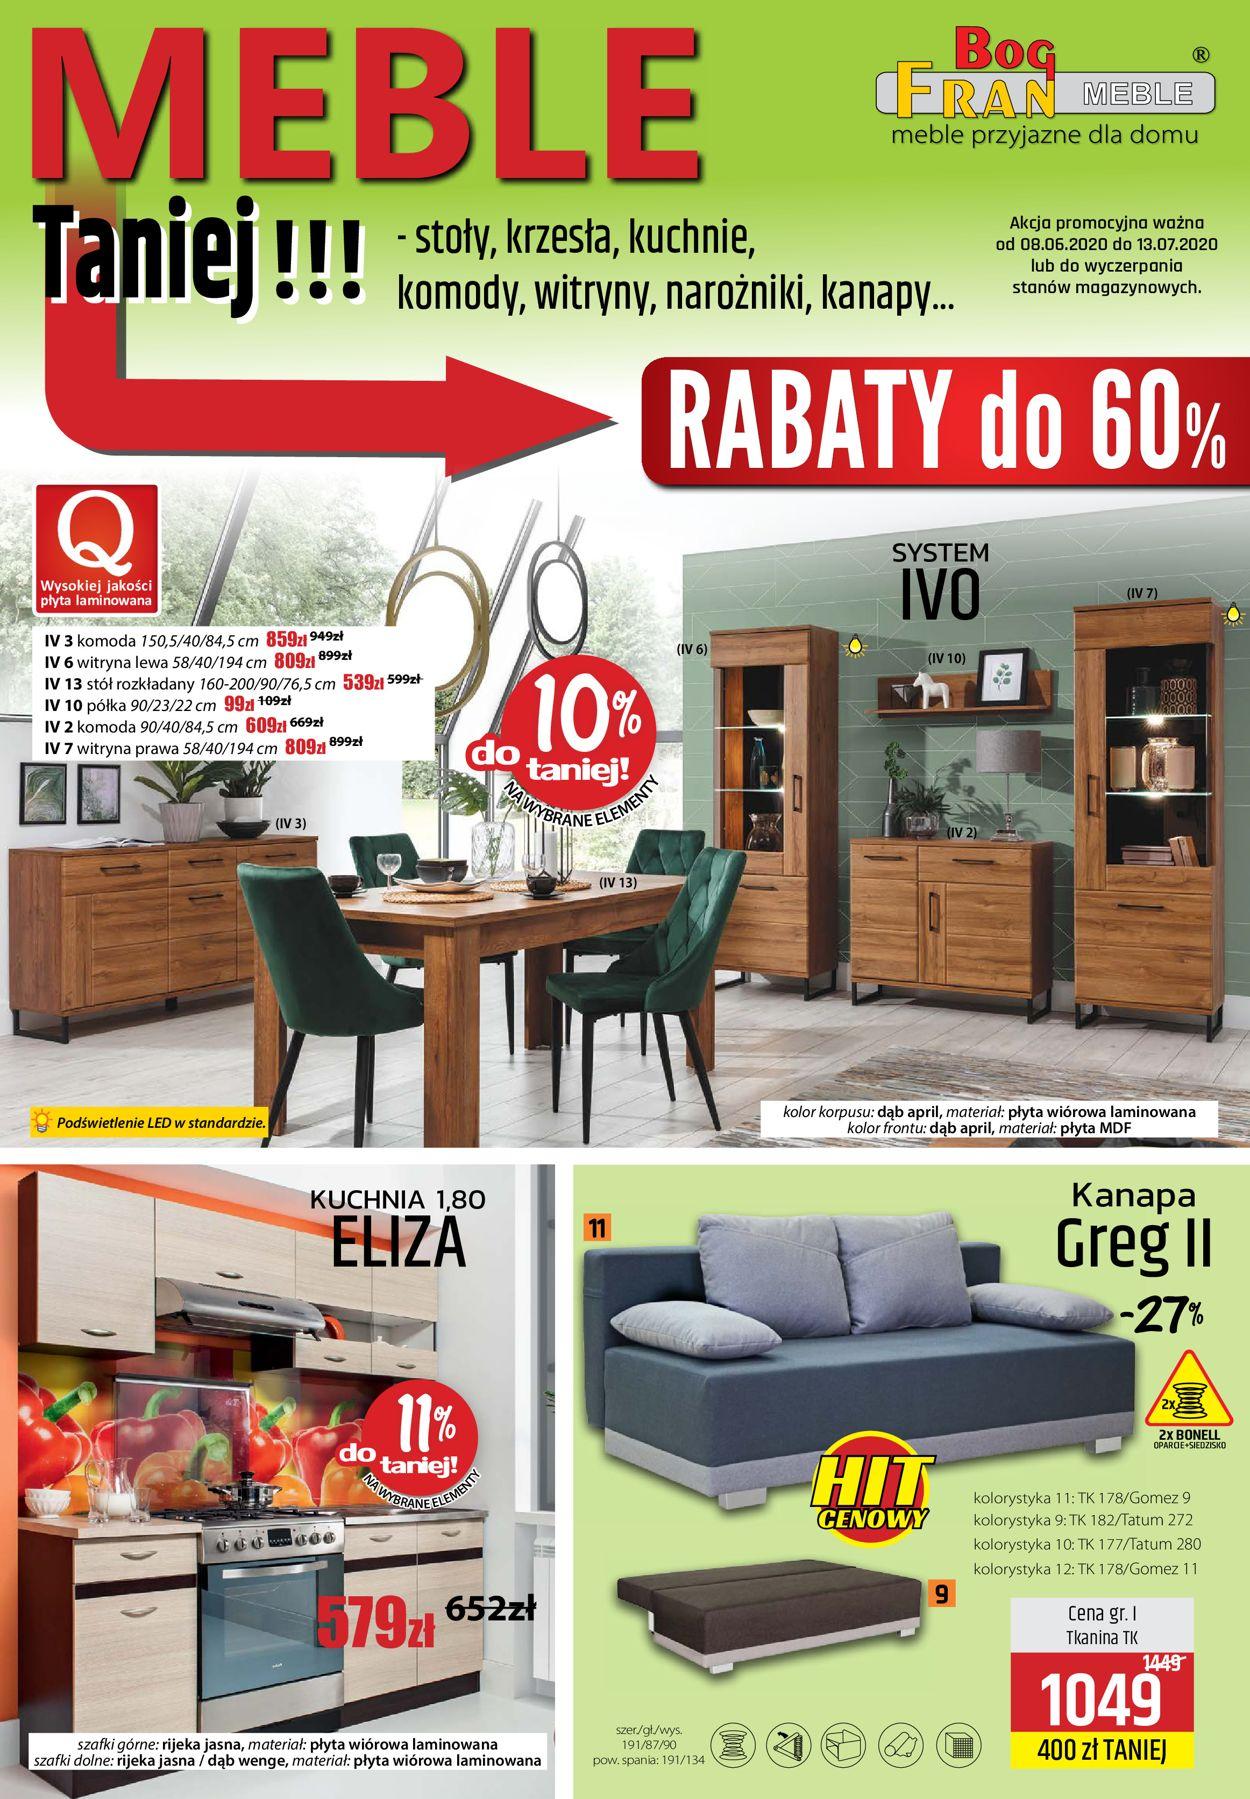 Gazetka promocyjna BOG-FRAN - 08.06-13.07.2020